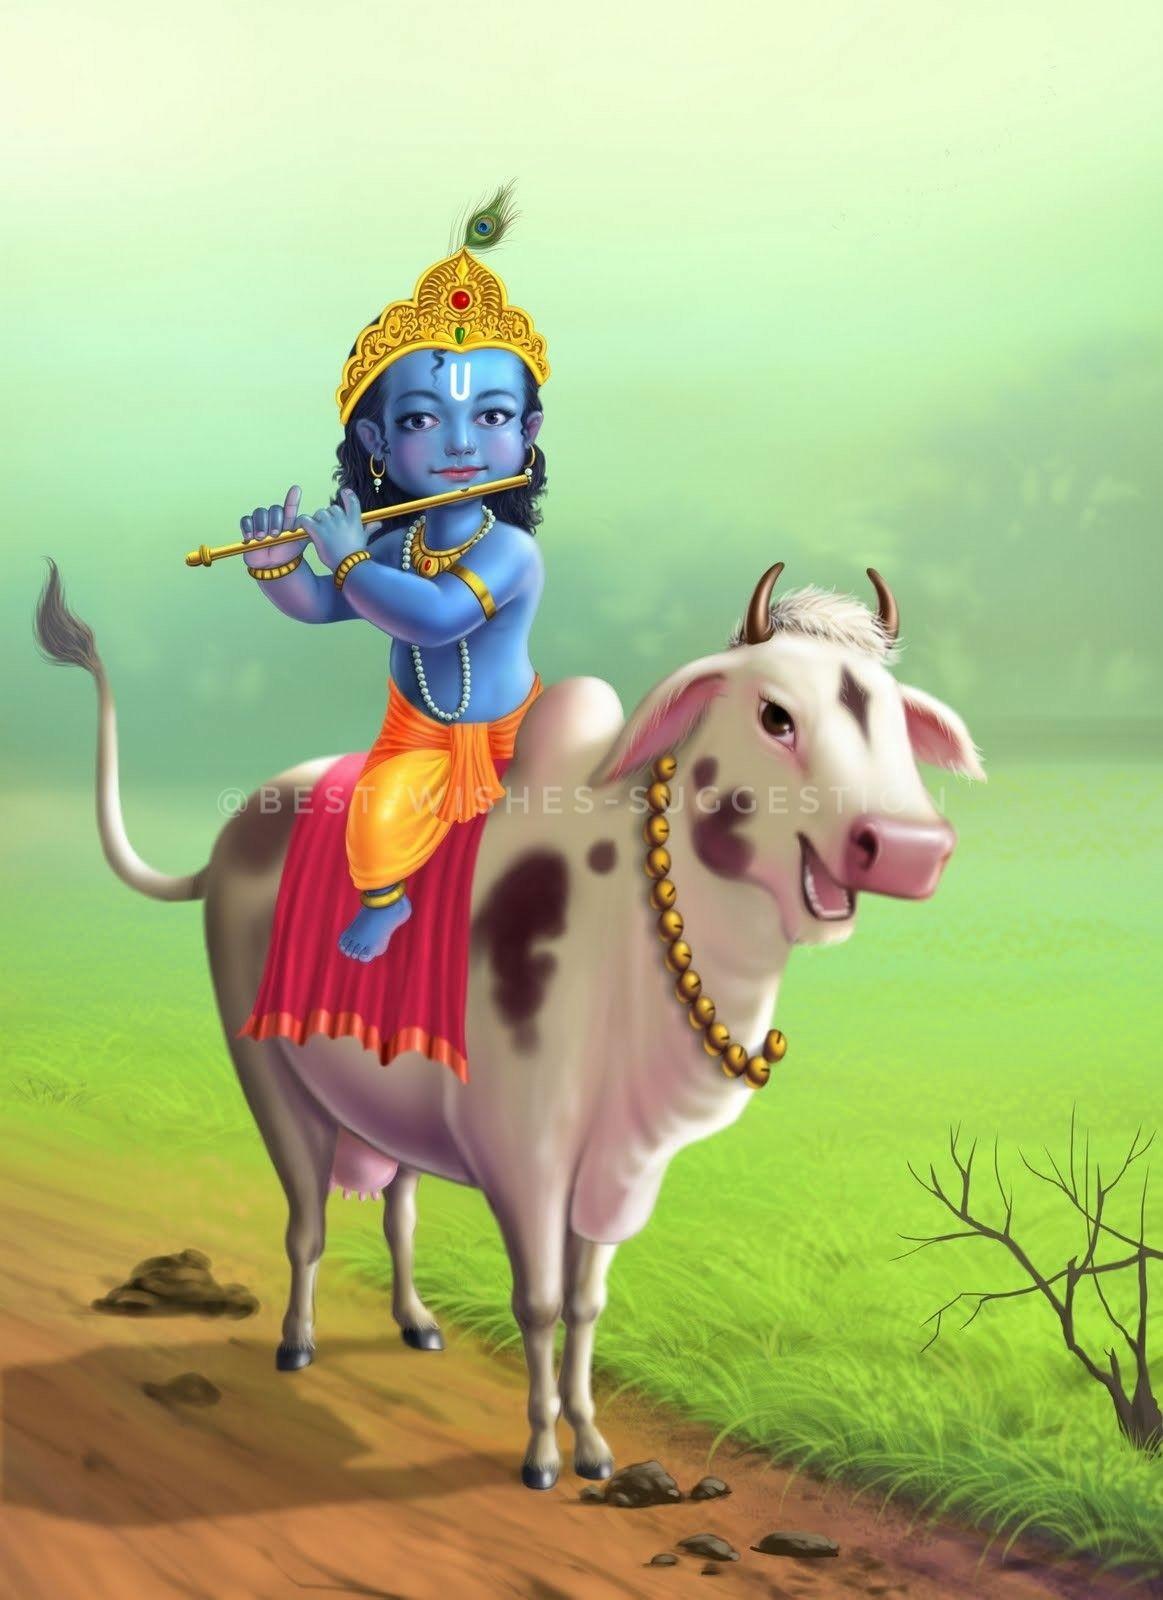 krishna-garden-image